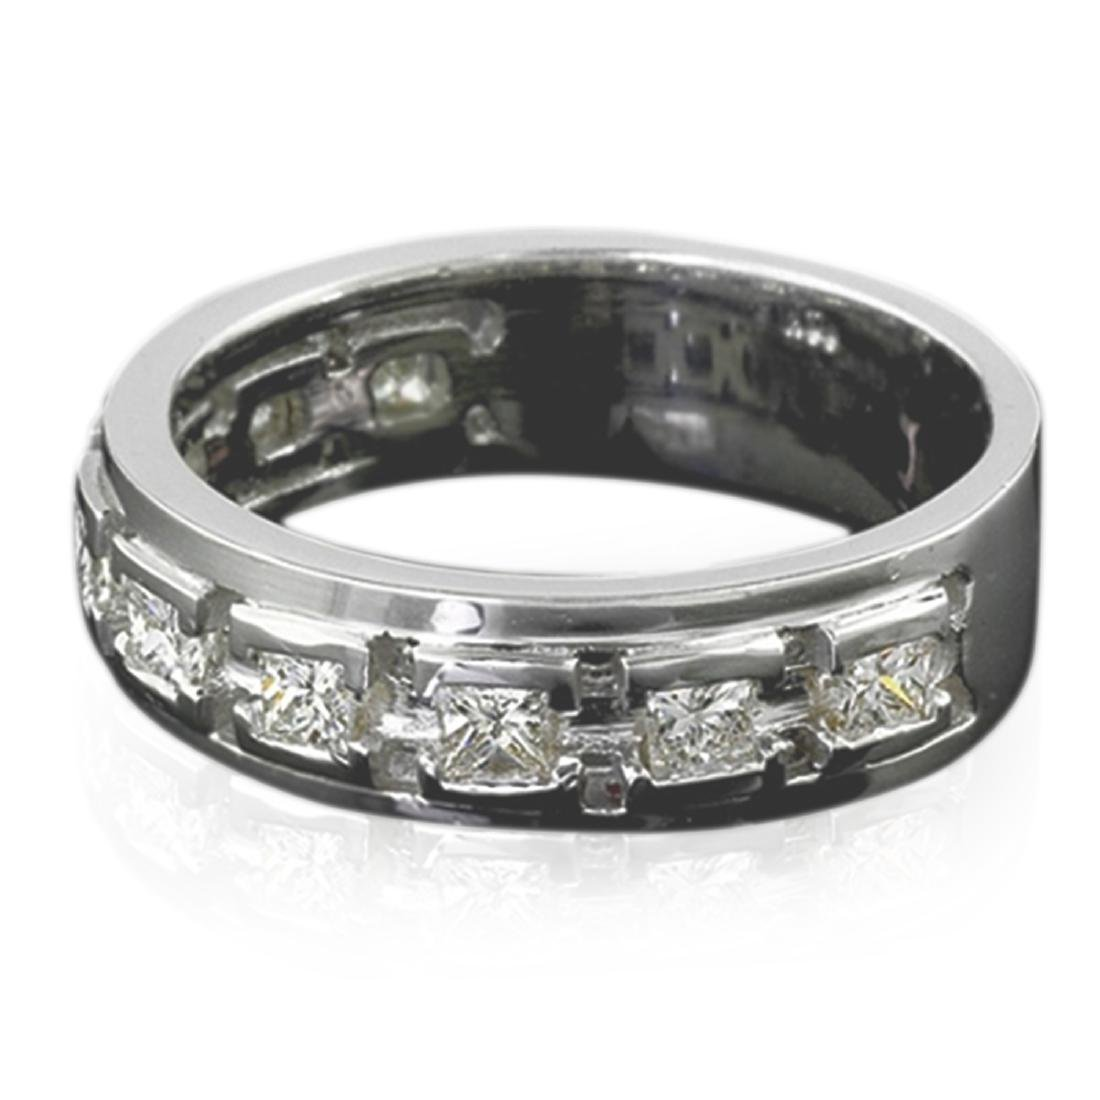 Mens 1.00 Carat Natural Diamond 18K Solid White Gold - 2